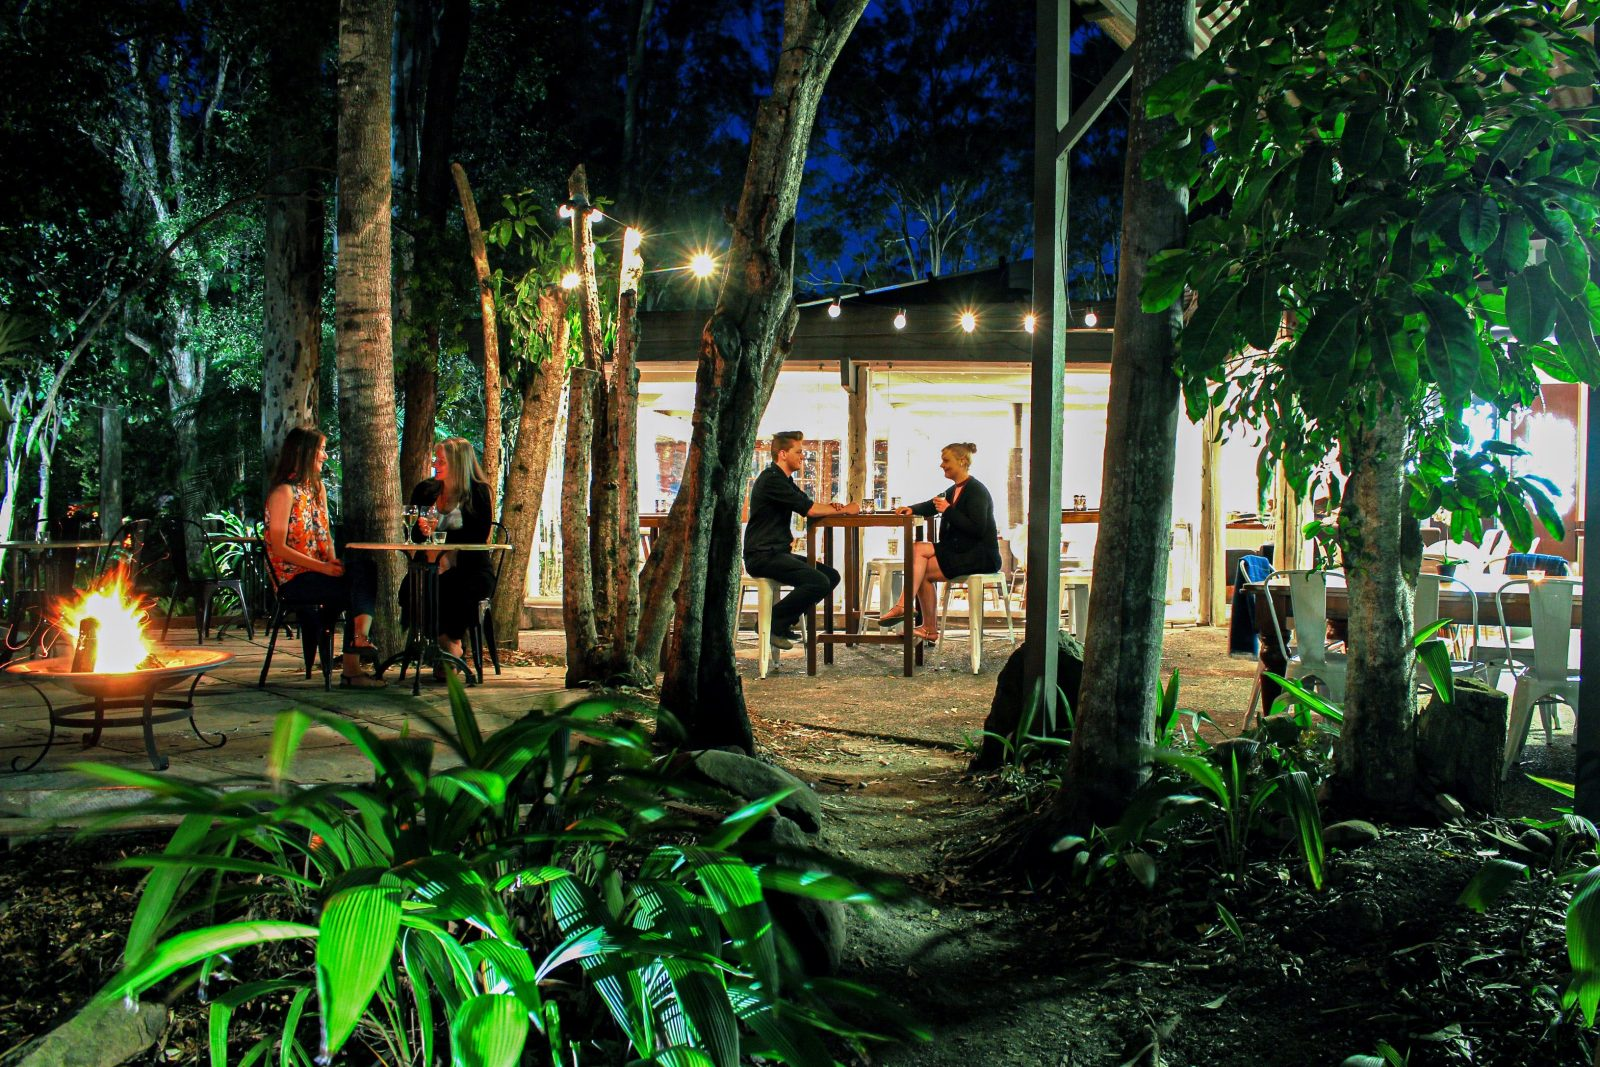 Rainforest Restaurant - Outdoor Evening